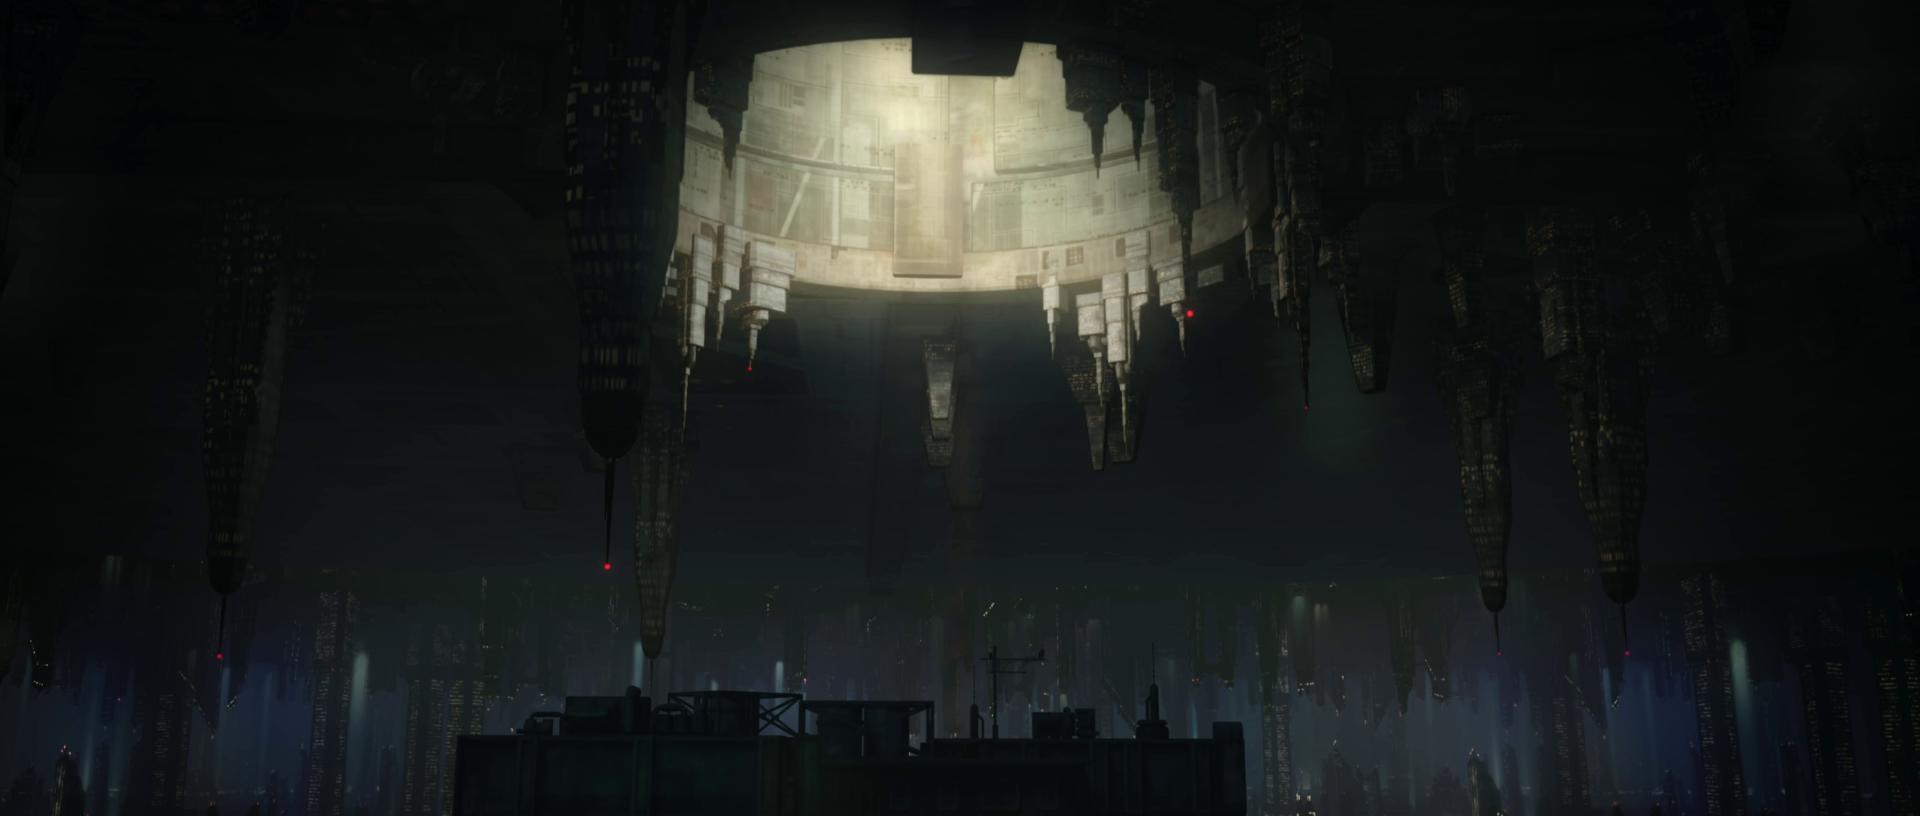 Coruscant Underworld Wookieepedia Fandom Powered By Wikia